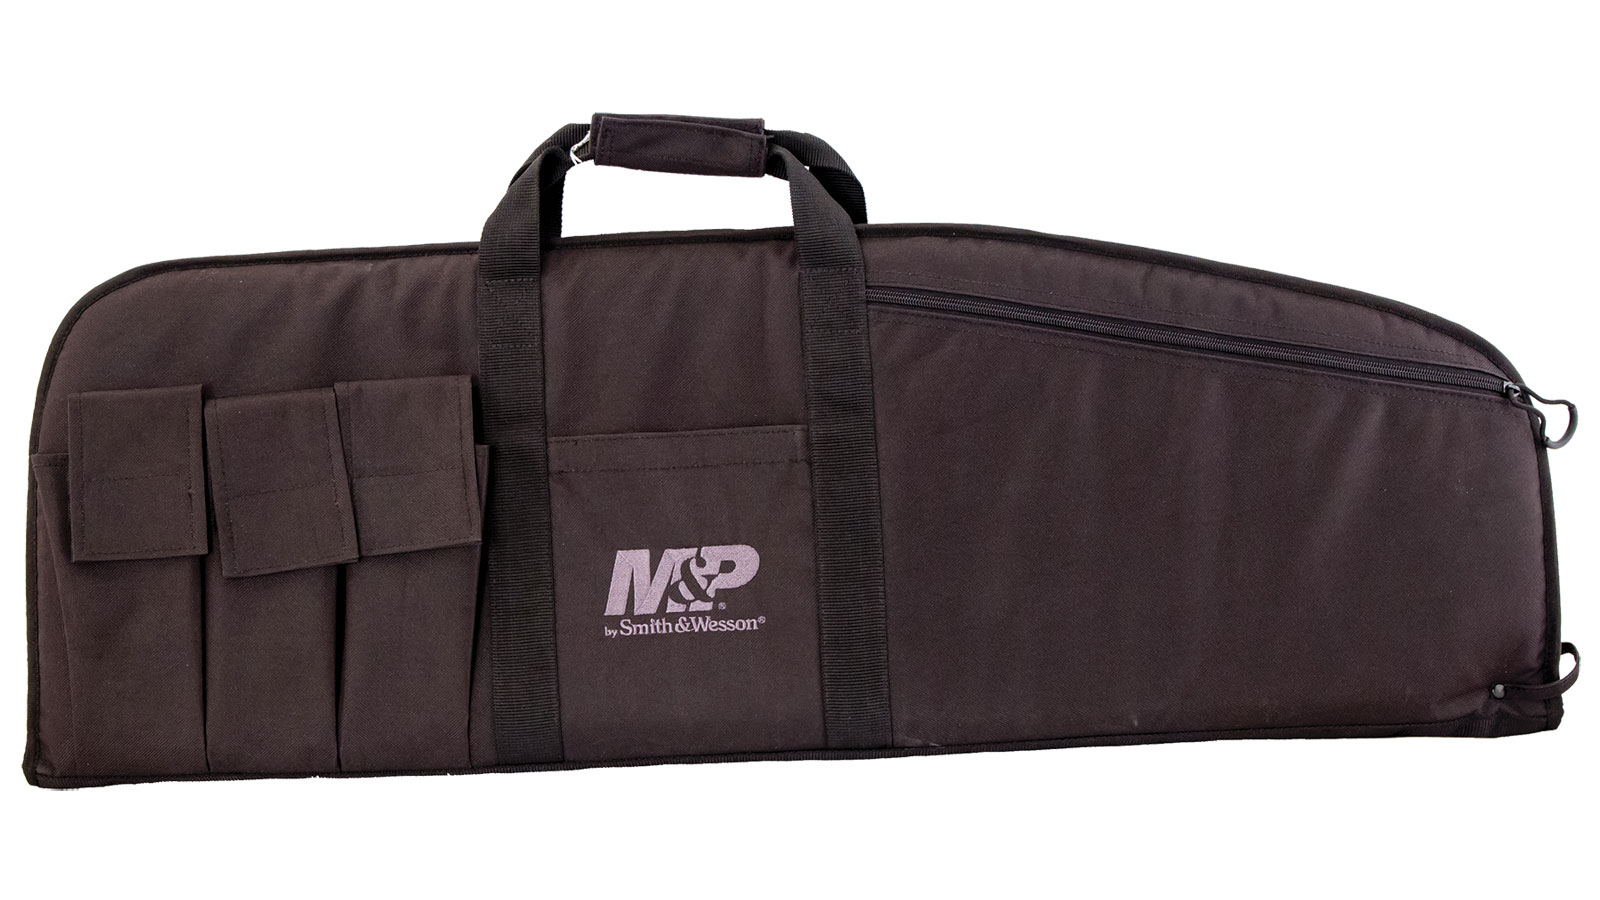 M&P Accessories 110014 Duty Series Small Rifle|Shotgun Case Nylon Smooth